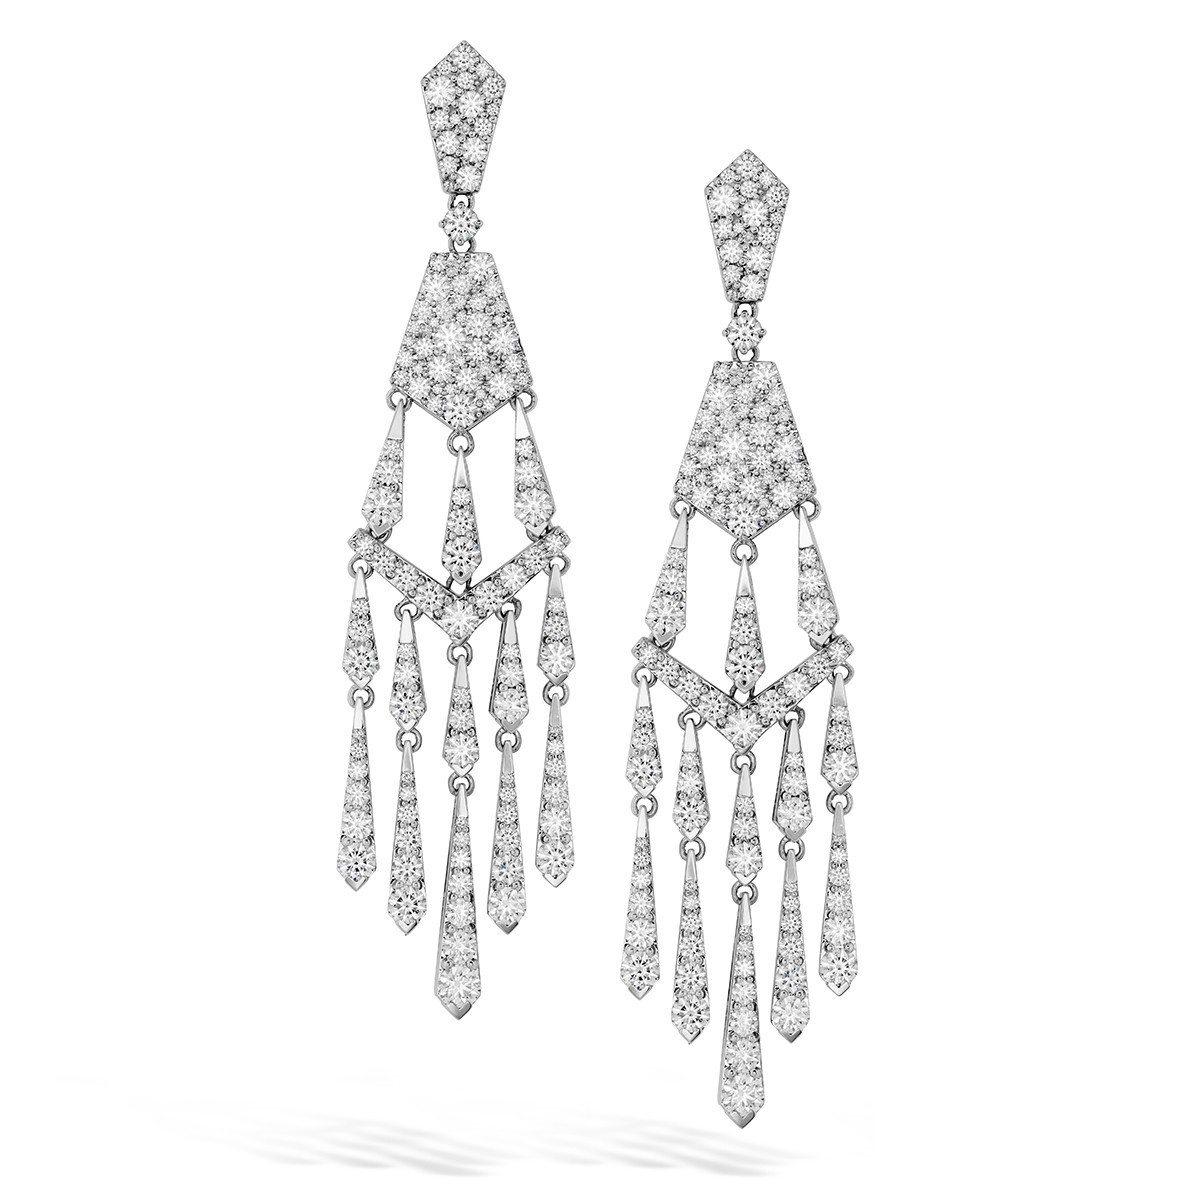 WhiteKites鑽石耳環,18K白金鑽石總重11.10克拉,265萬元起。圖...